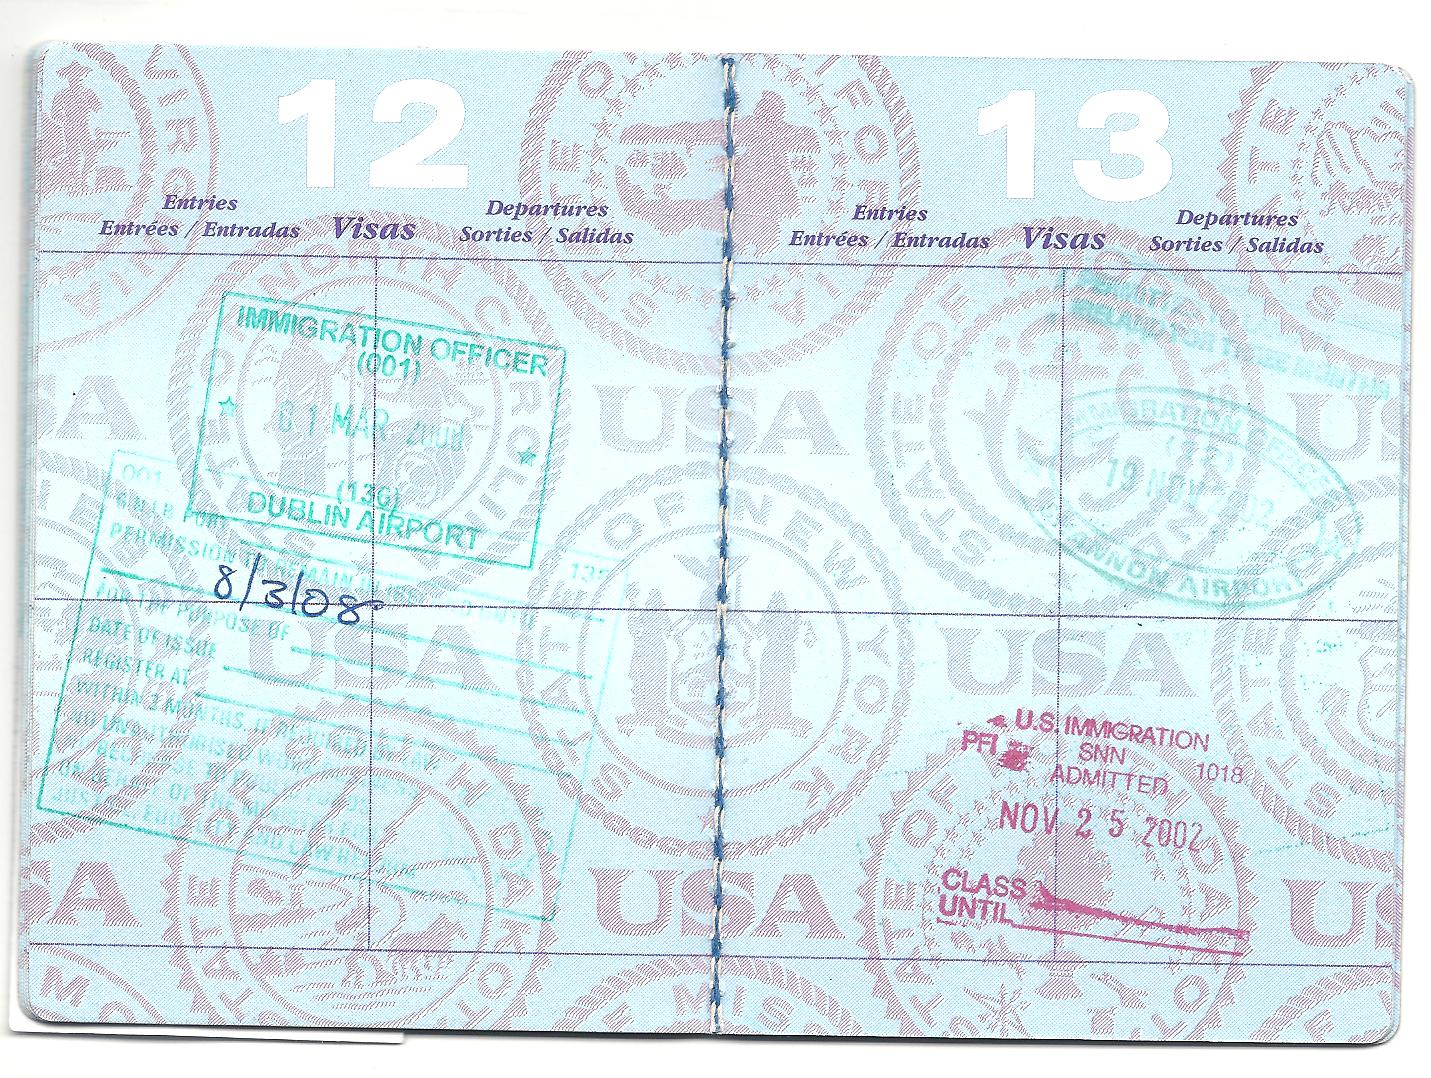 Travel to Ireland : Passport or Visa?